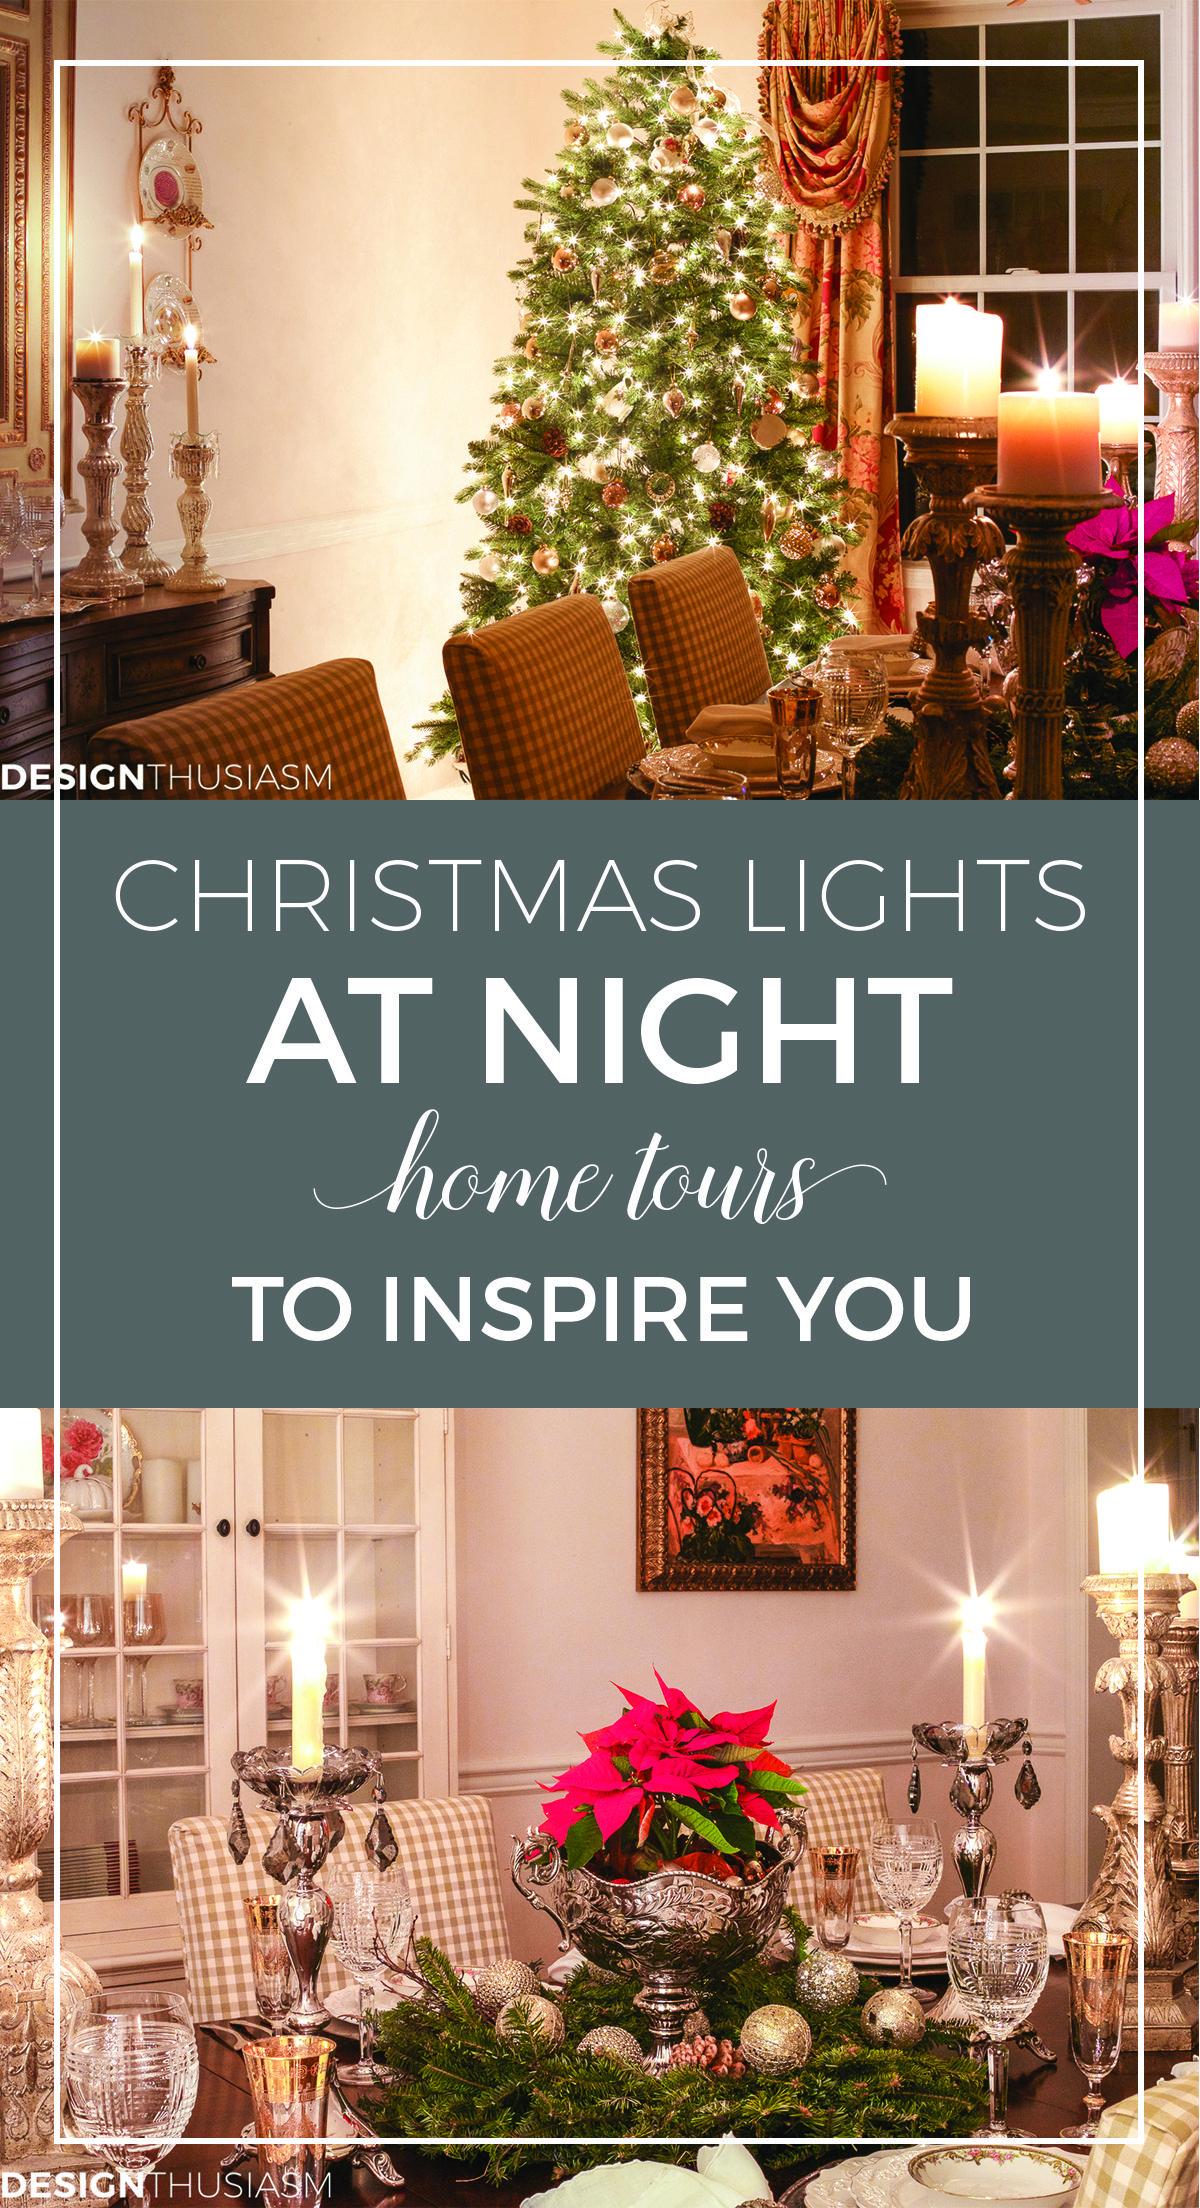 Night lights holiday - Christmas Night Lights Holiday Homes At Night Blog Tour